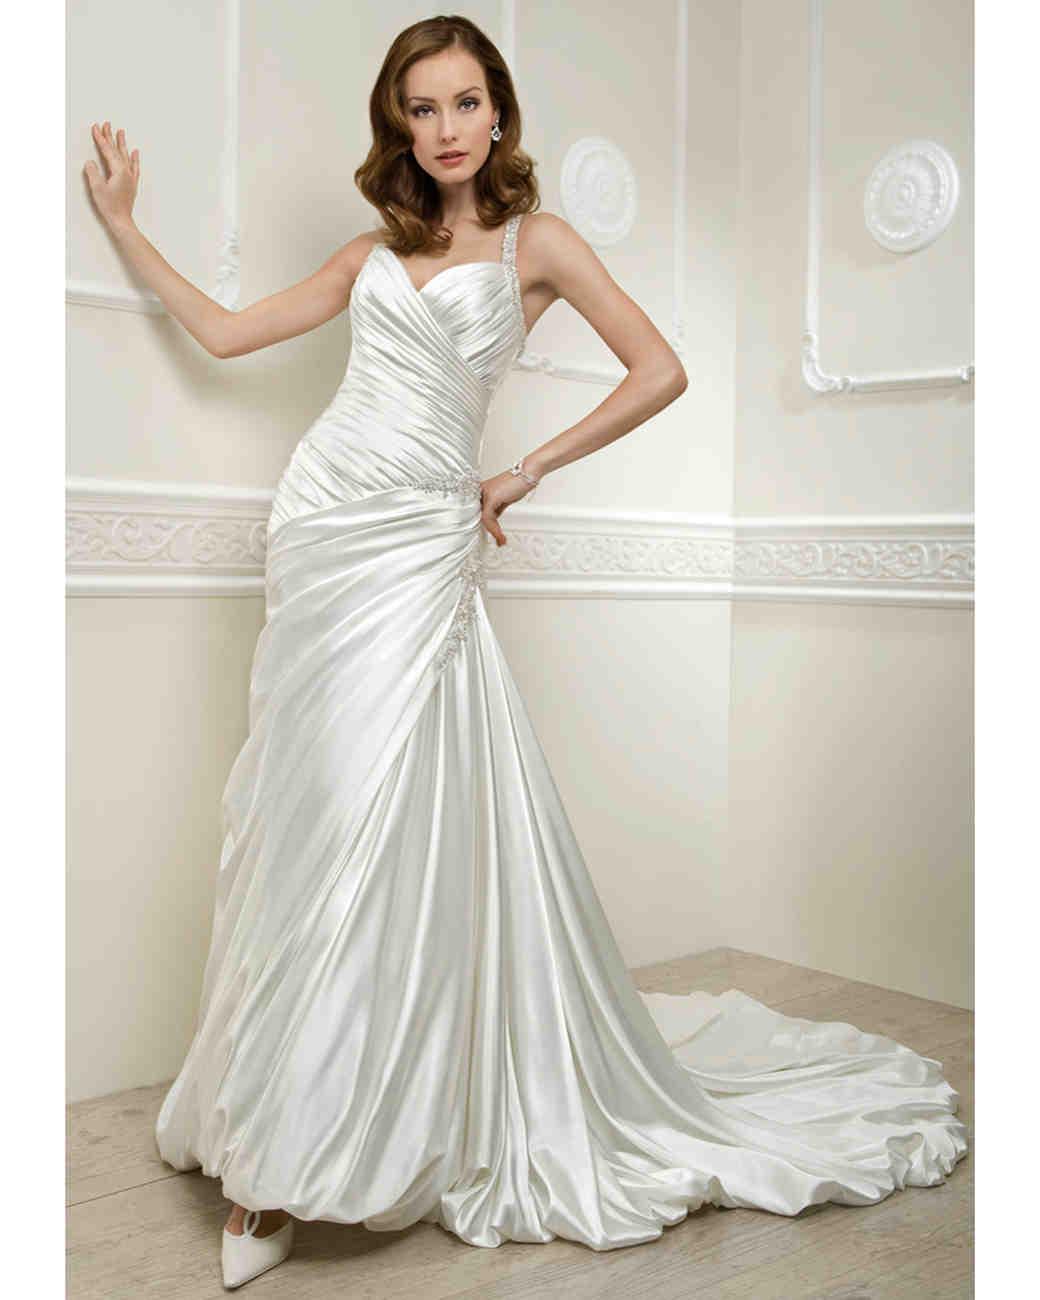 dressbraw cheap wedding party dresses 7606